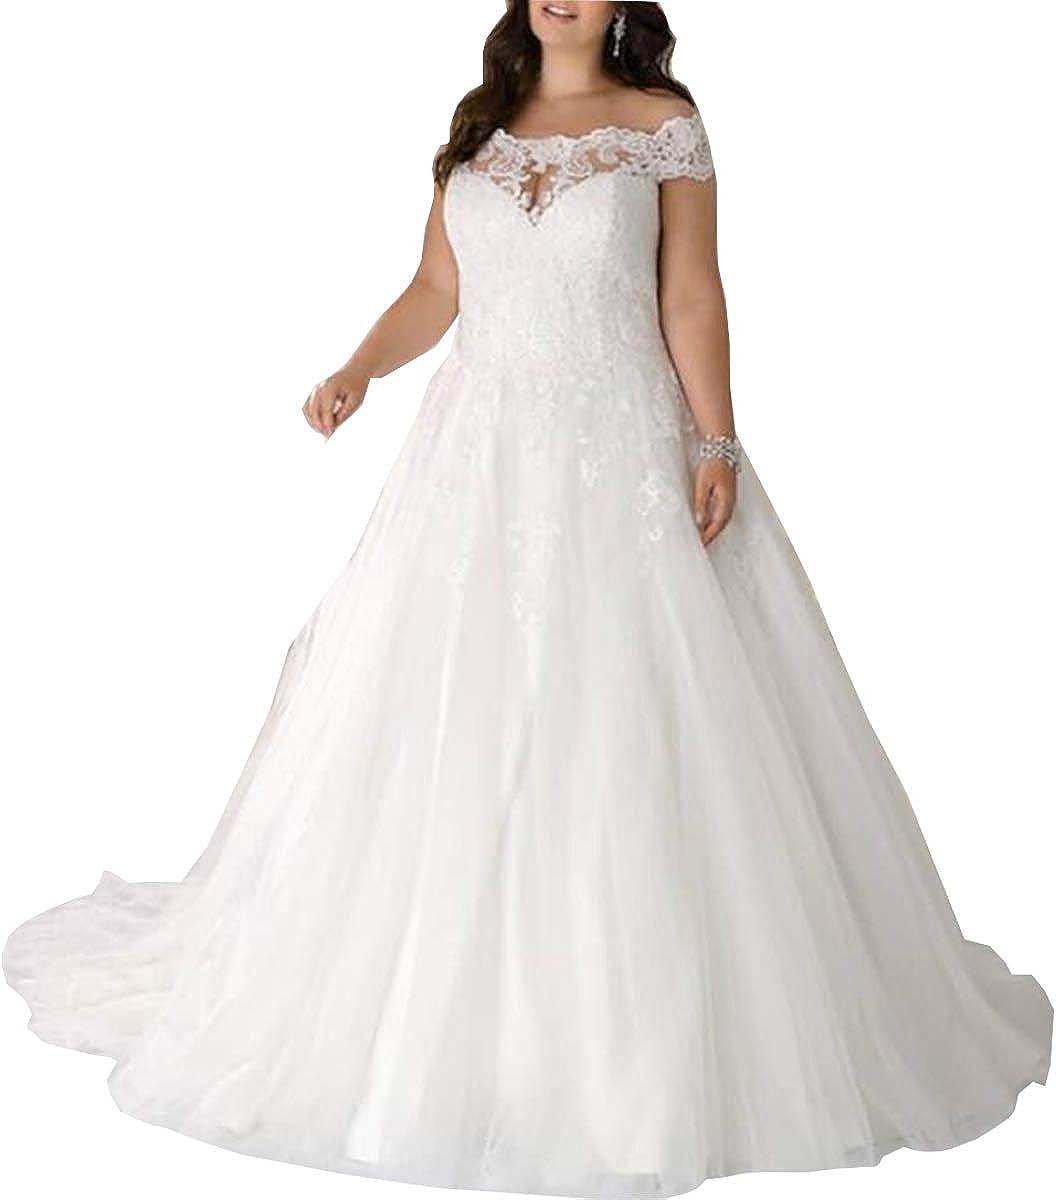 Mengxiaohe Women's Elegant Long Skirt Train Lace Skirt Beach Plus Size Lace Up Back Wedding Dress